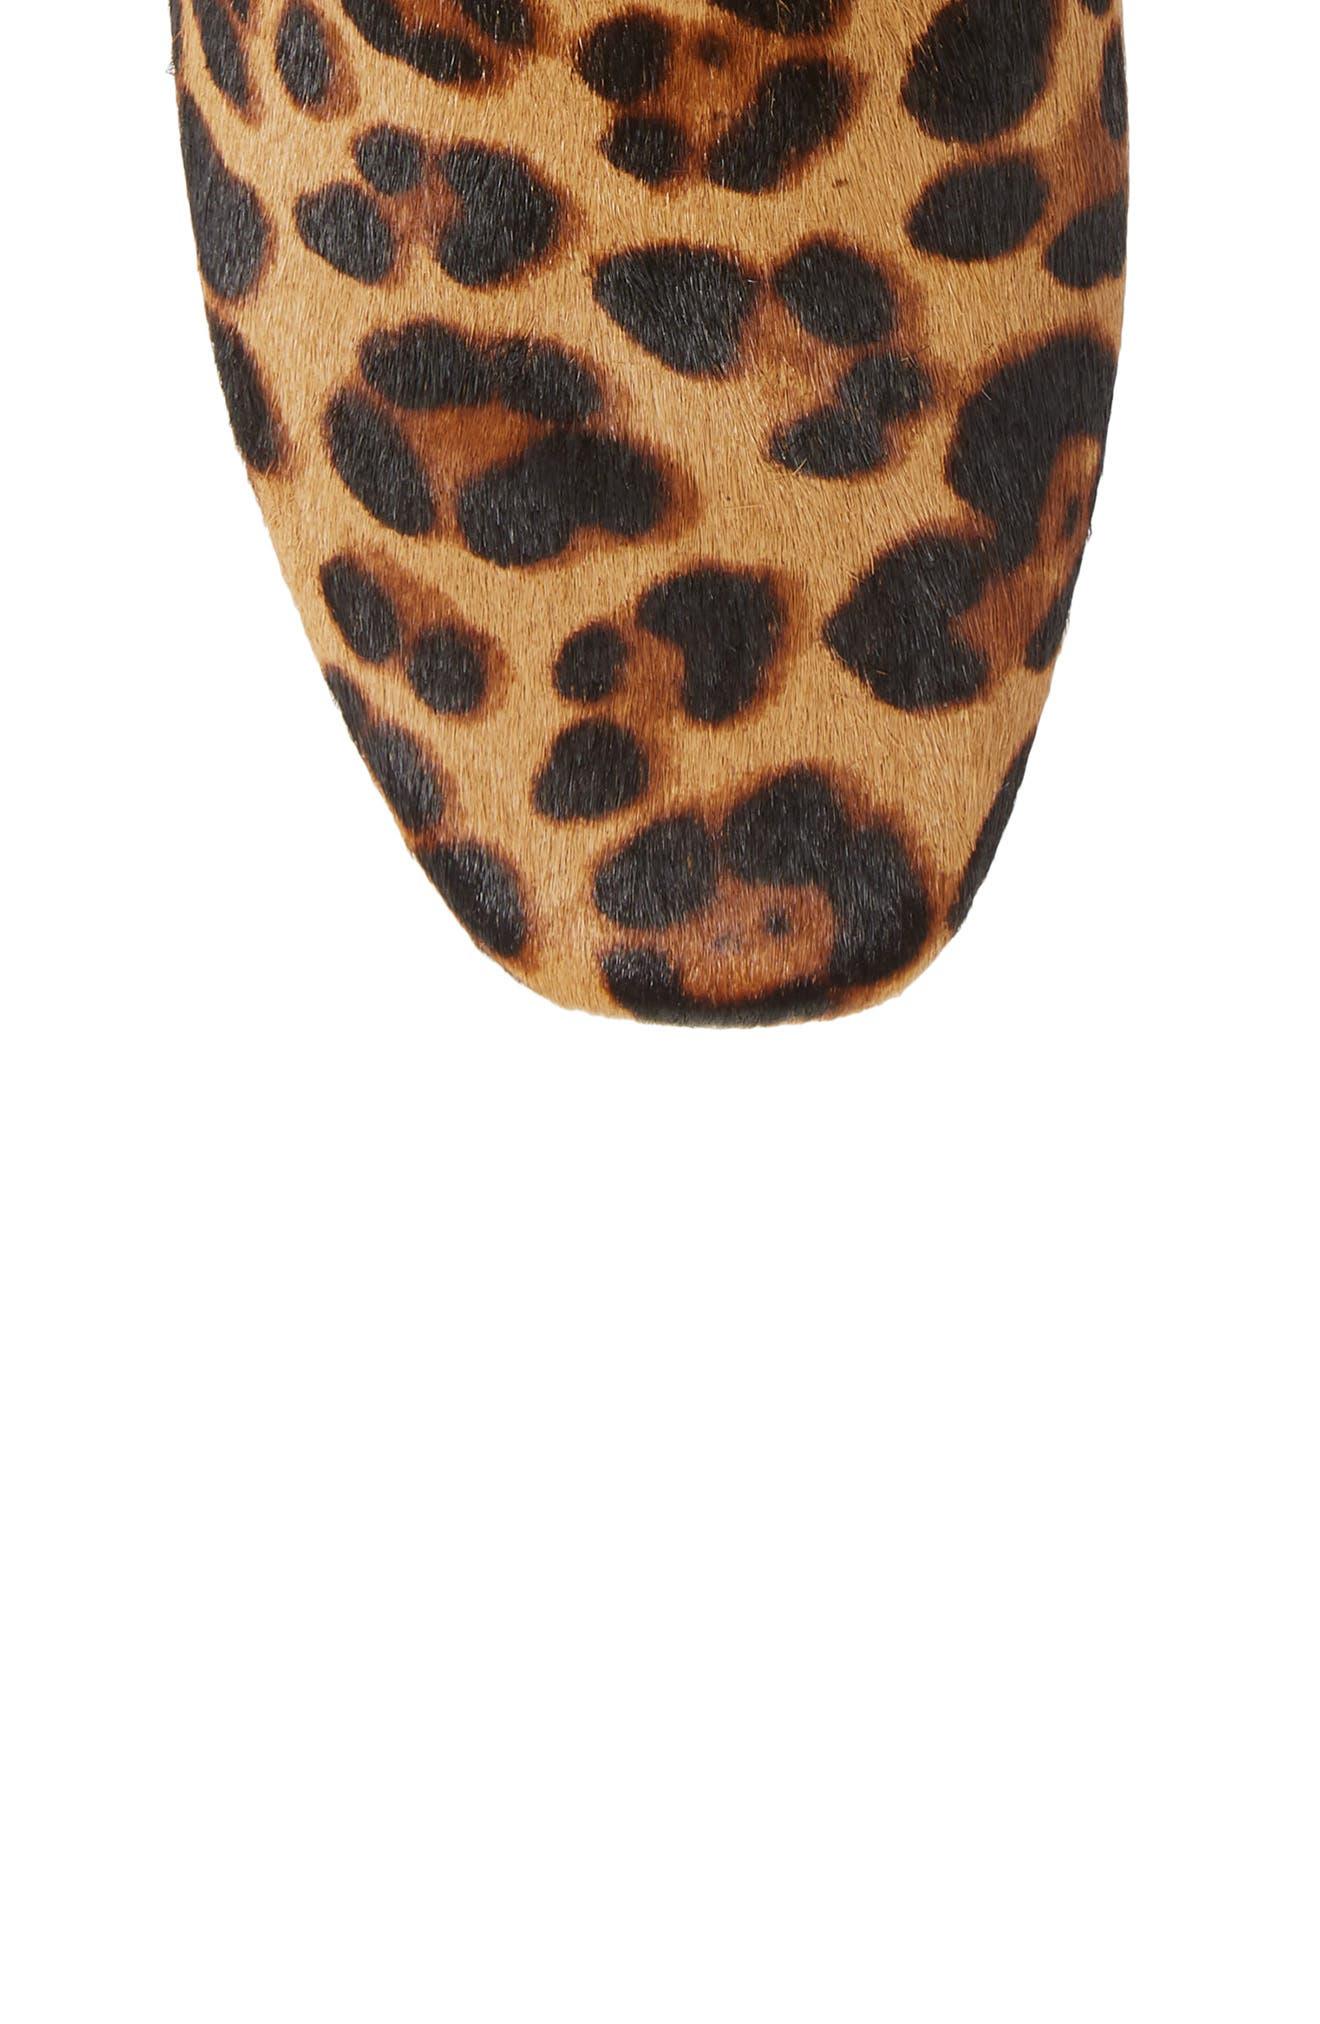 MADEWELL, The Jada Genuine Calf Hair Boot, Alternate thumbnail 5, color, 200